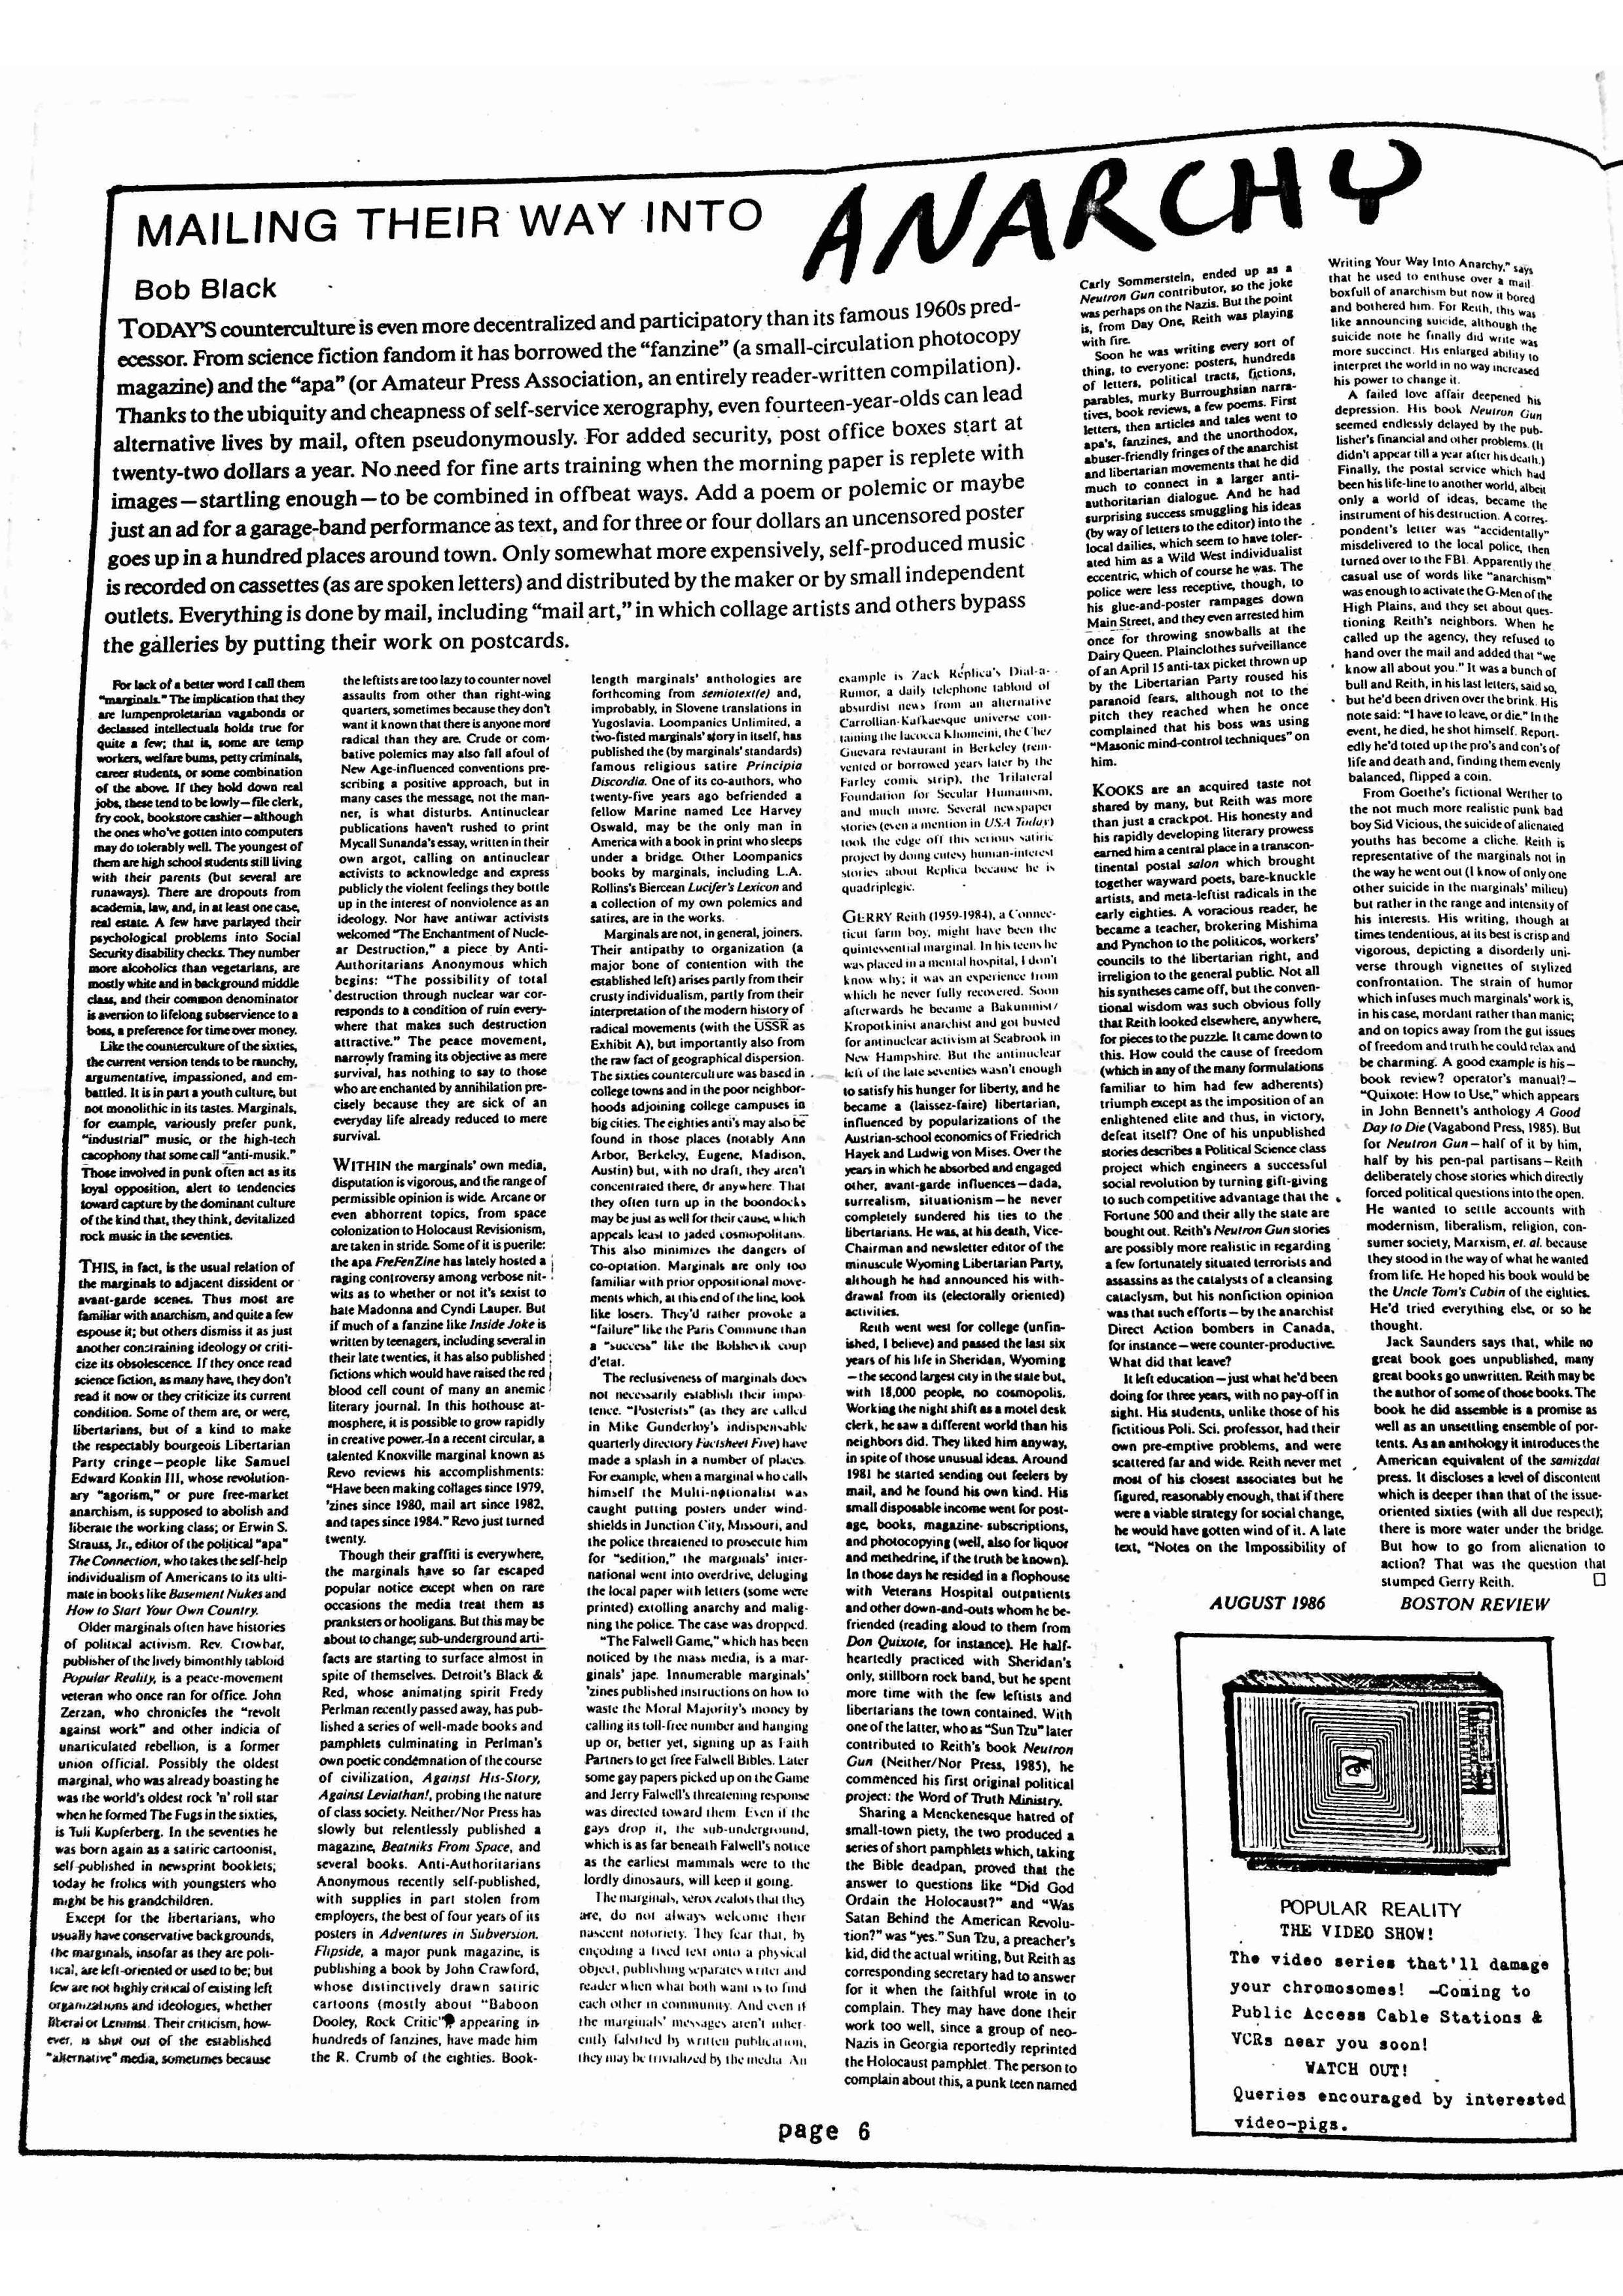 PopRealNo15-page-008.jpg